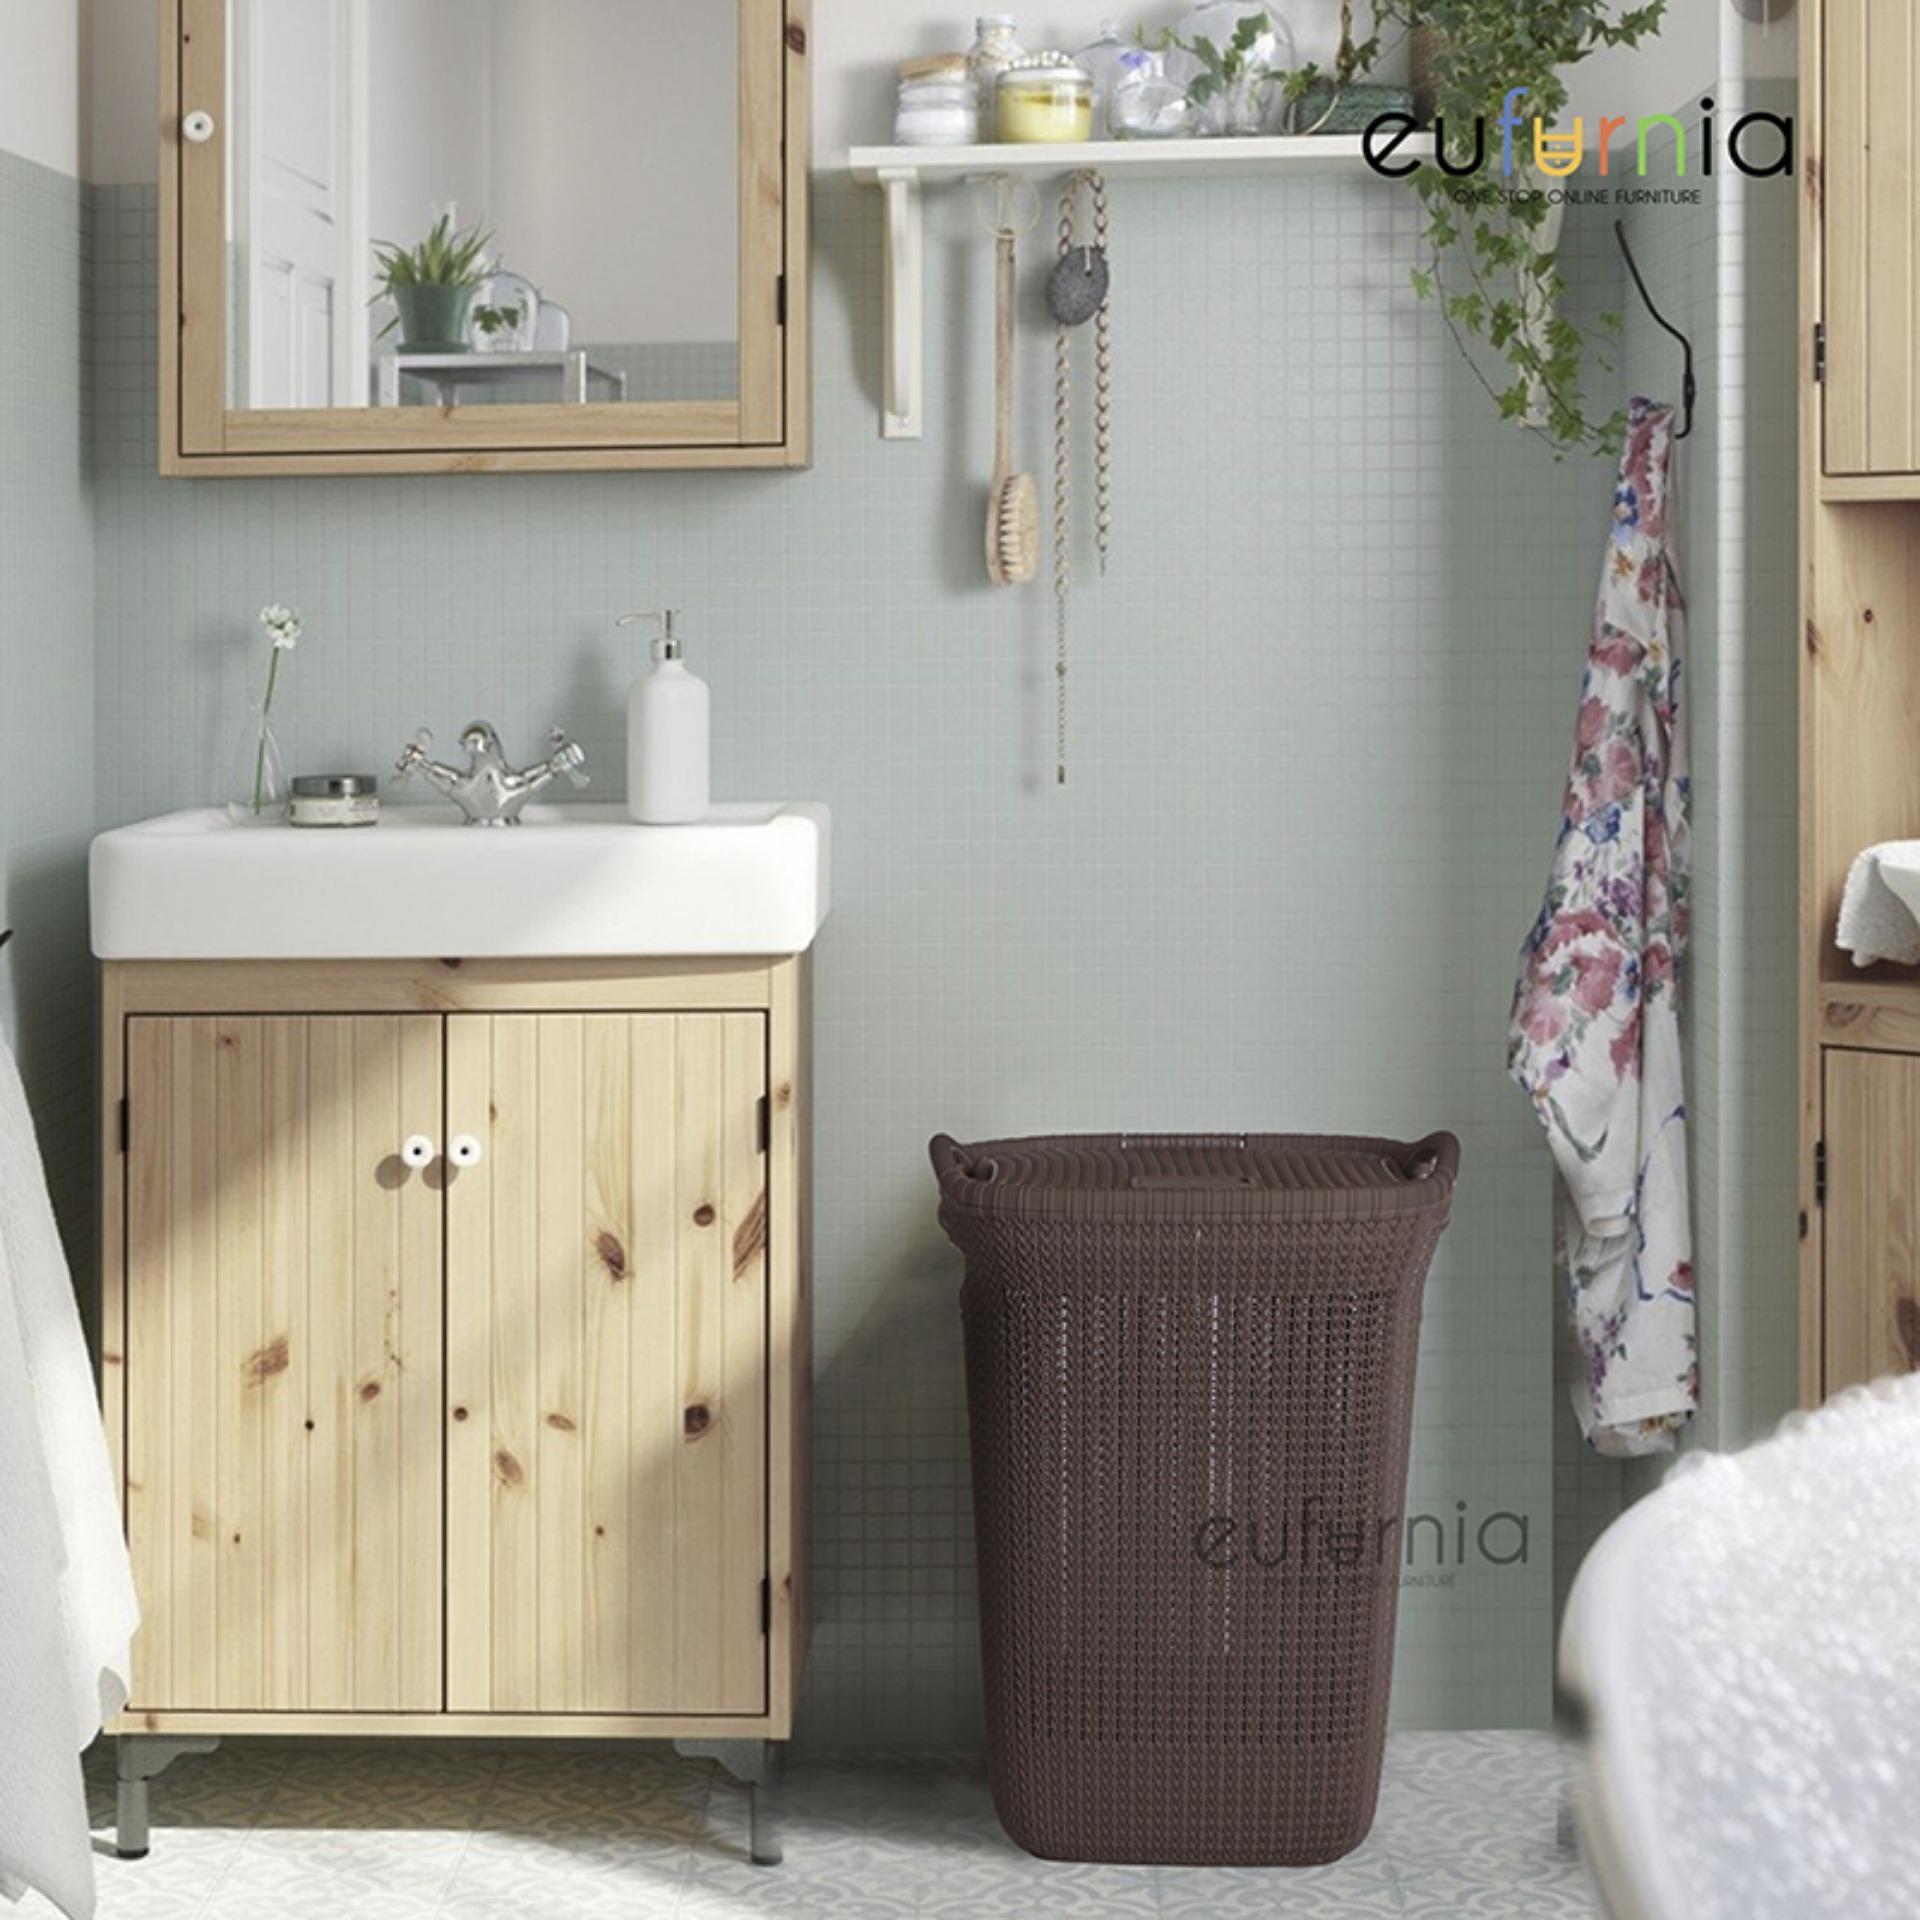 Tempat Baju Kotor Eufurnia Olymplast Laundry Basket - OLB / 100% FREE ONGKIR JAWA DENPASAR